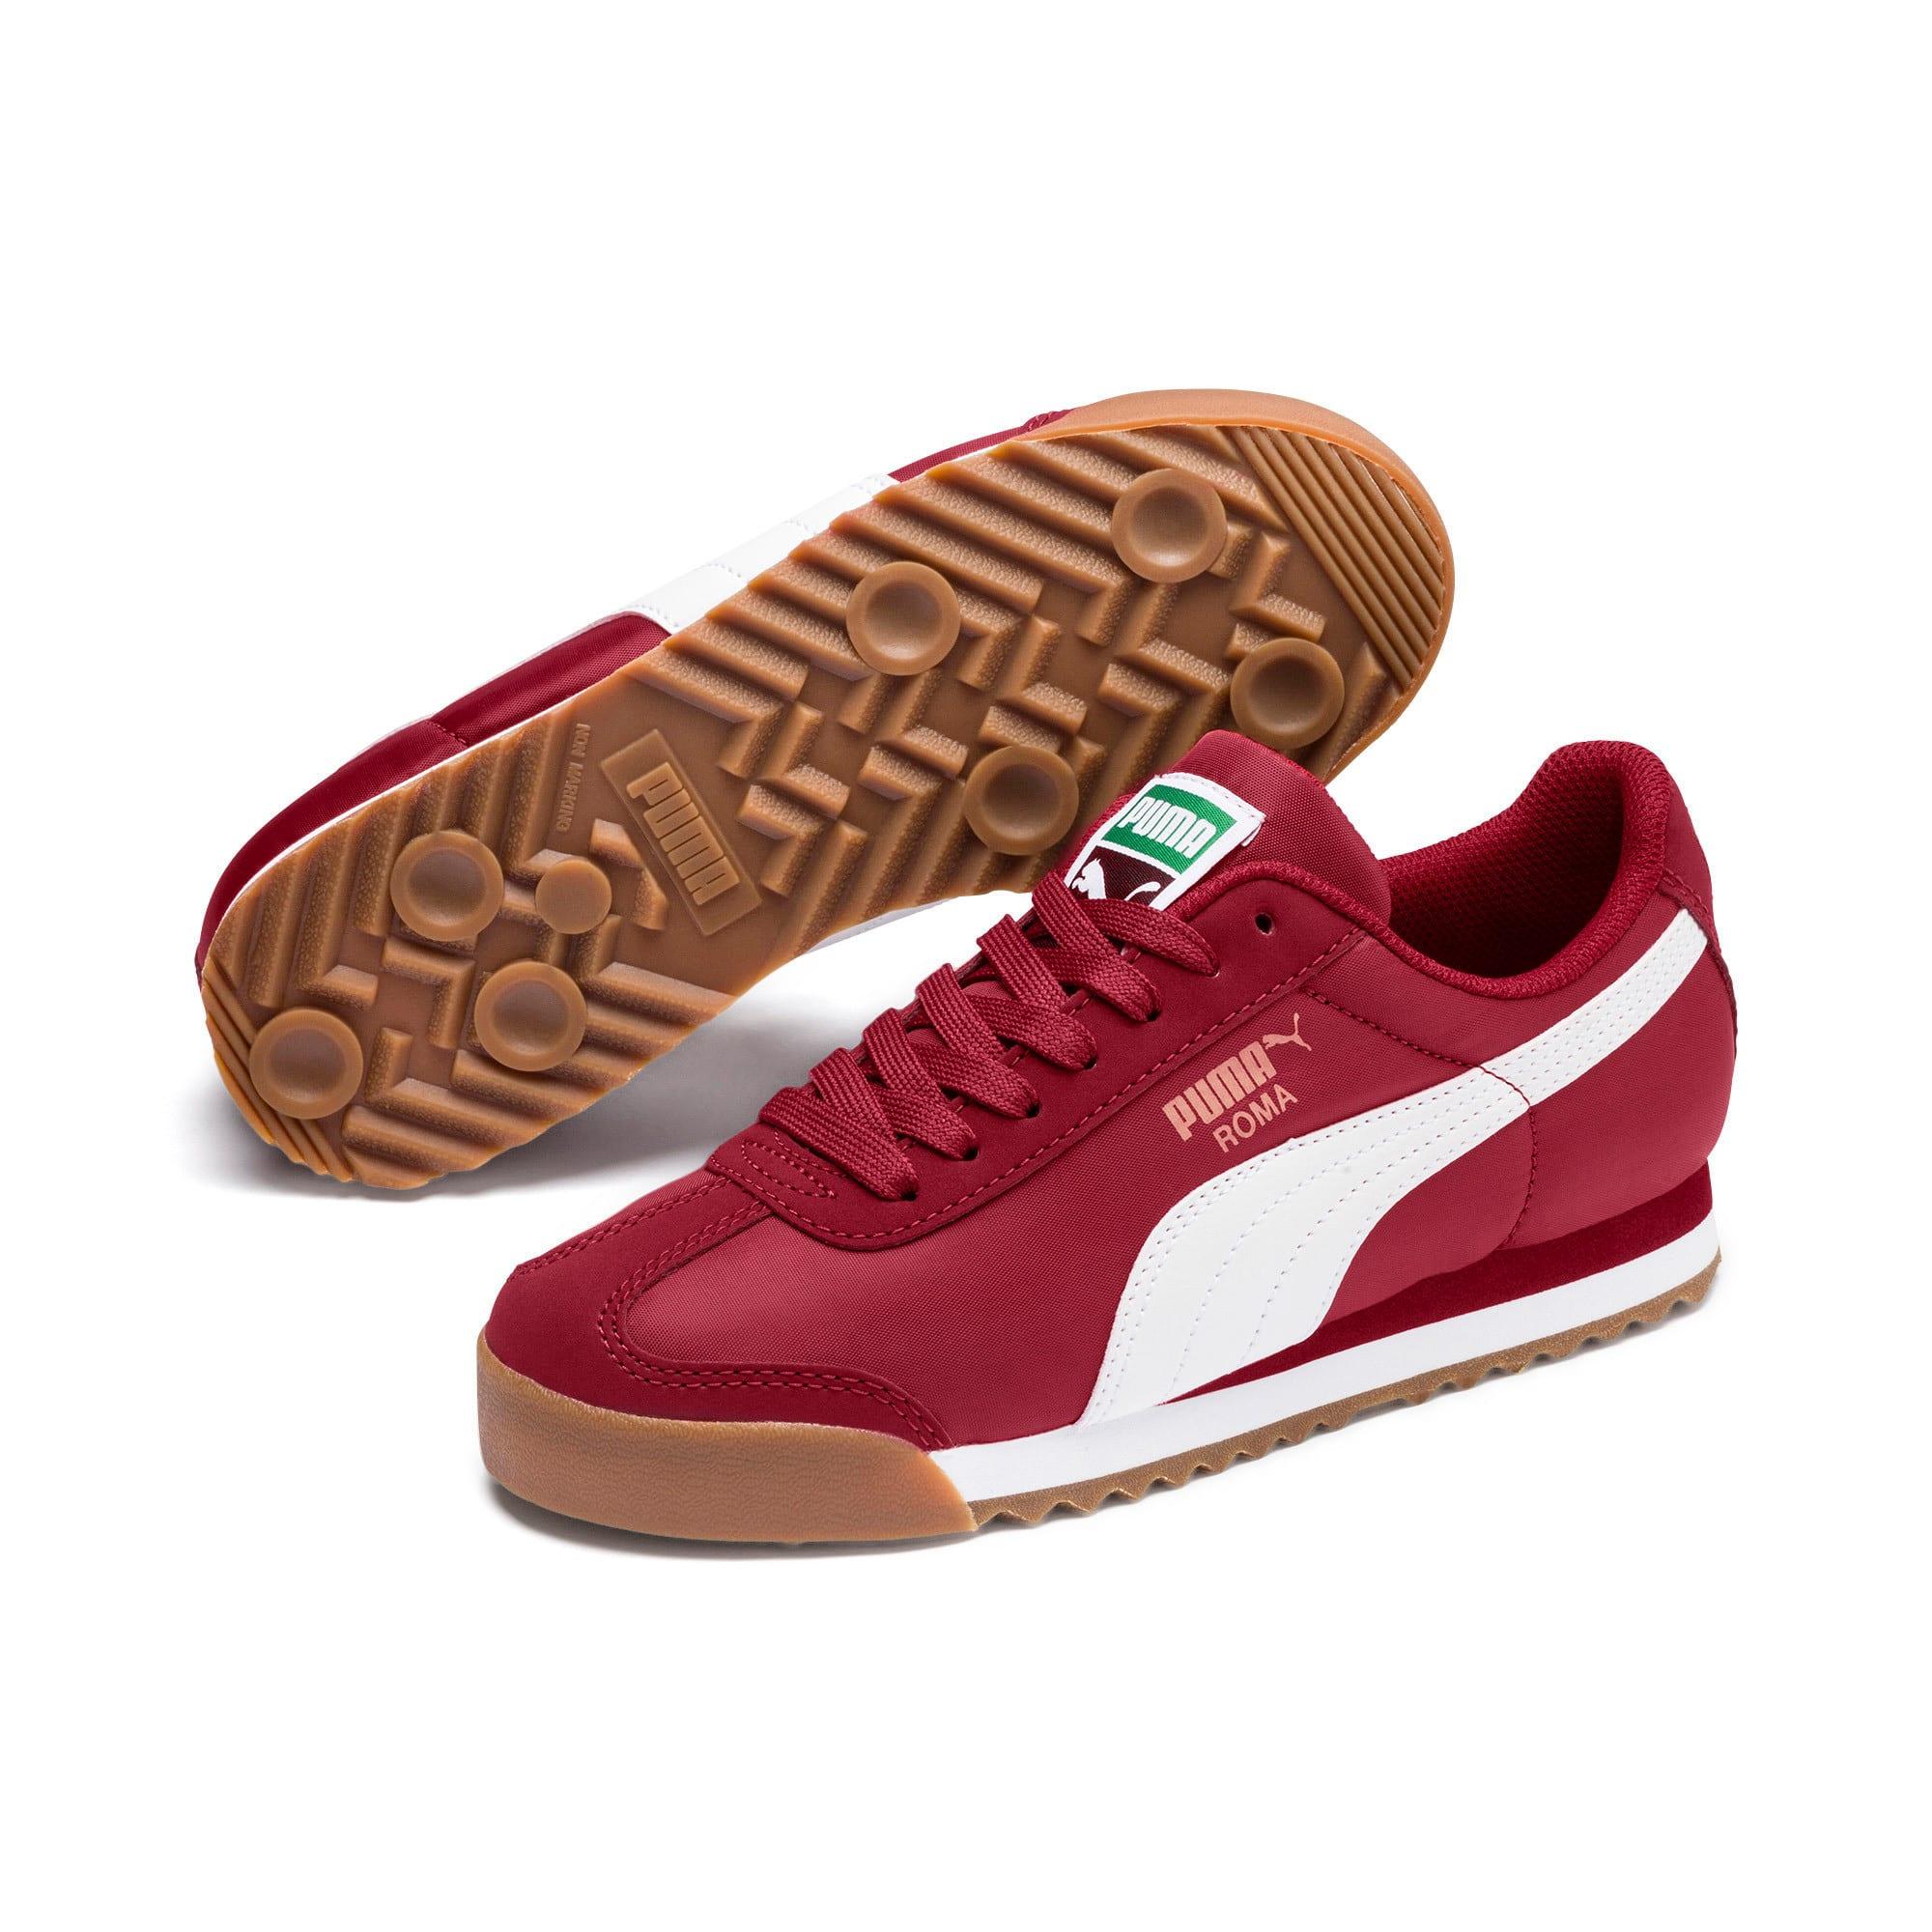 Thumbnail 1 of Roma Basic Summer Sneakers JR, Rhubarb-Puma White, medium